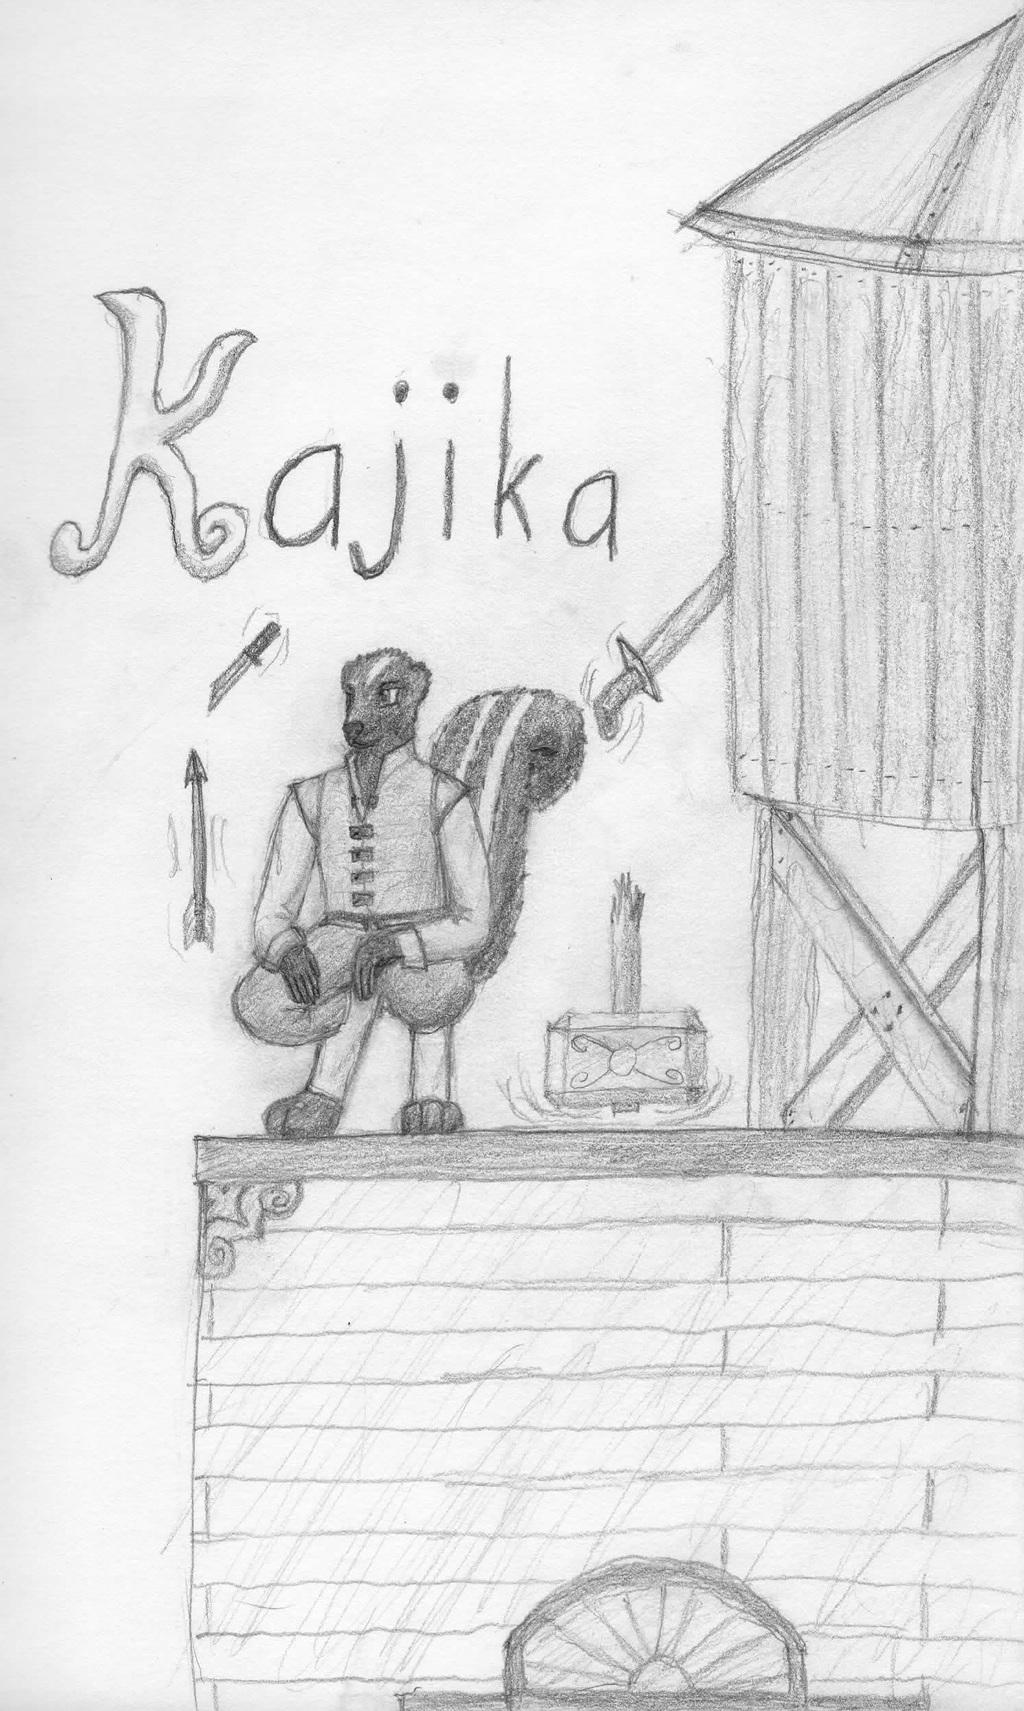 Most recent image: Kajika Redone